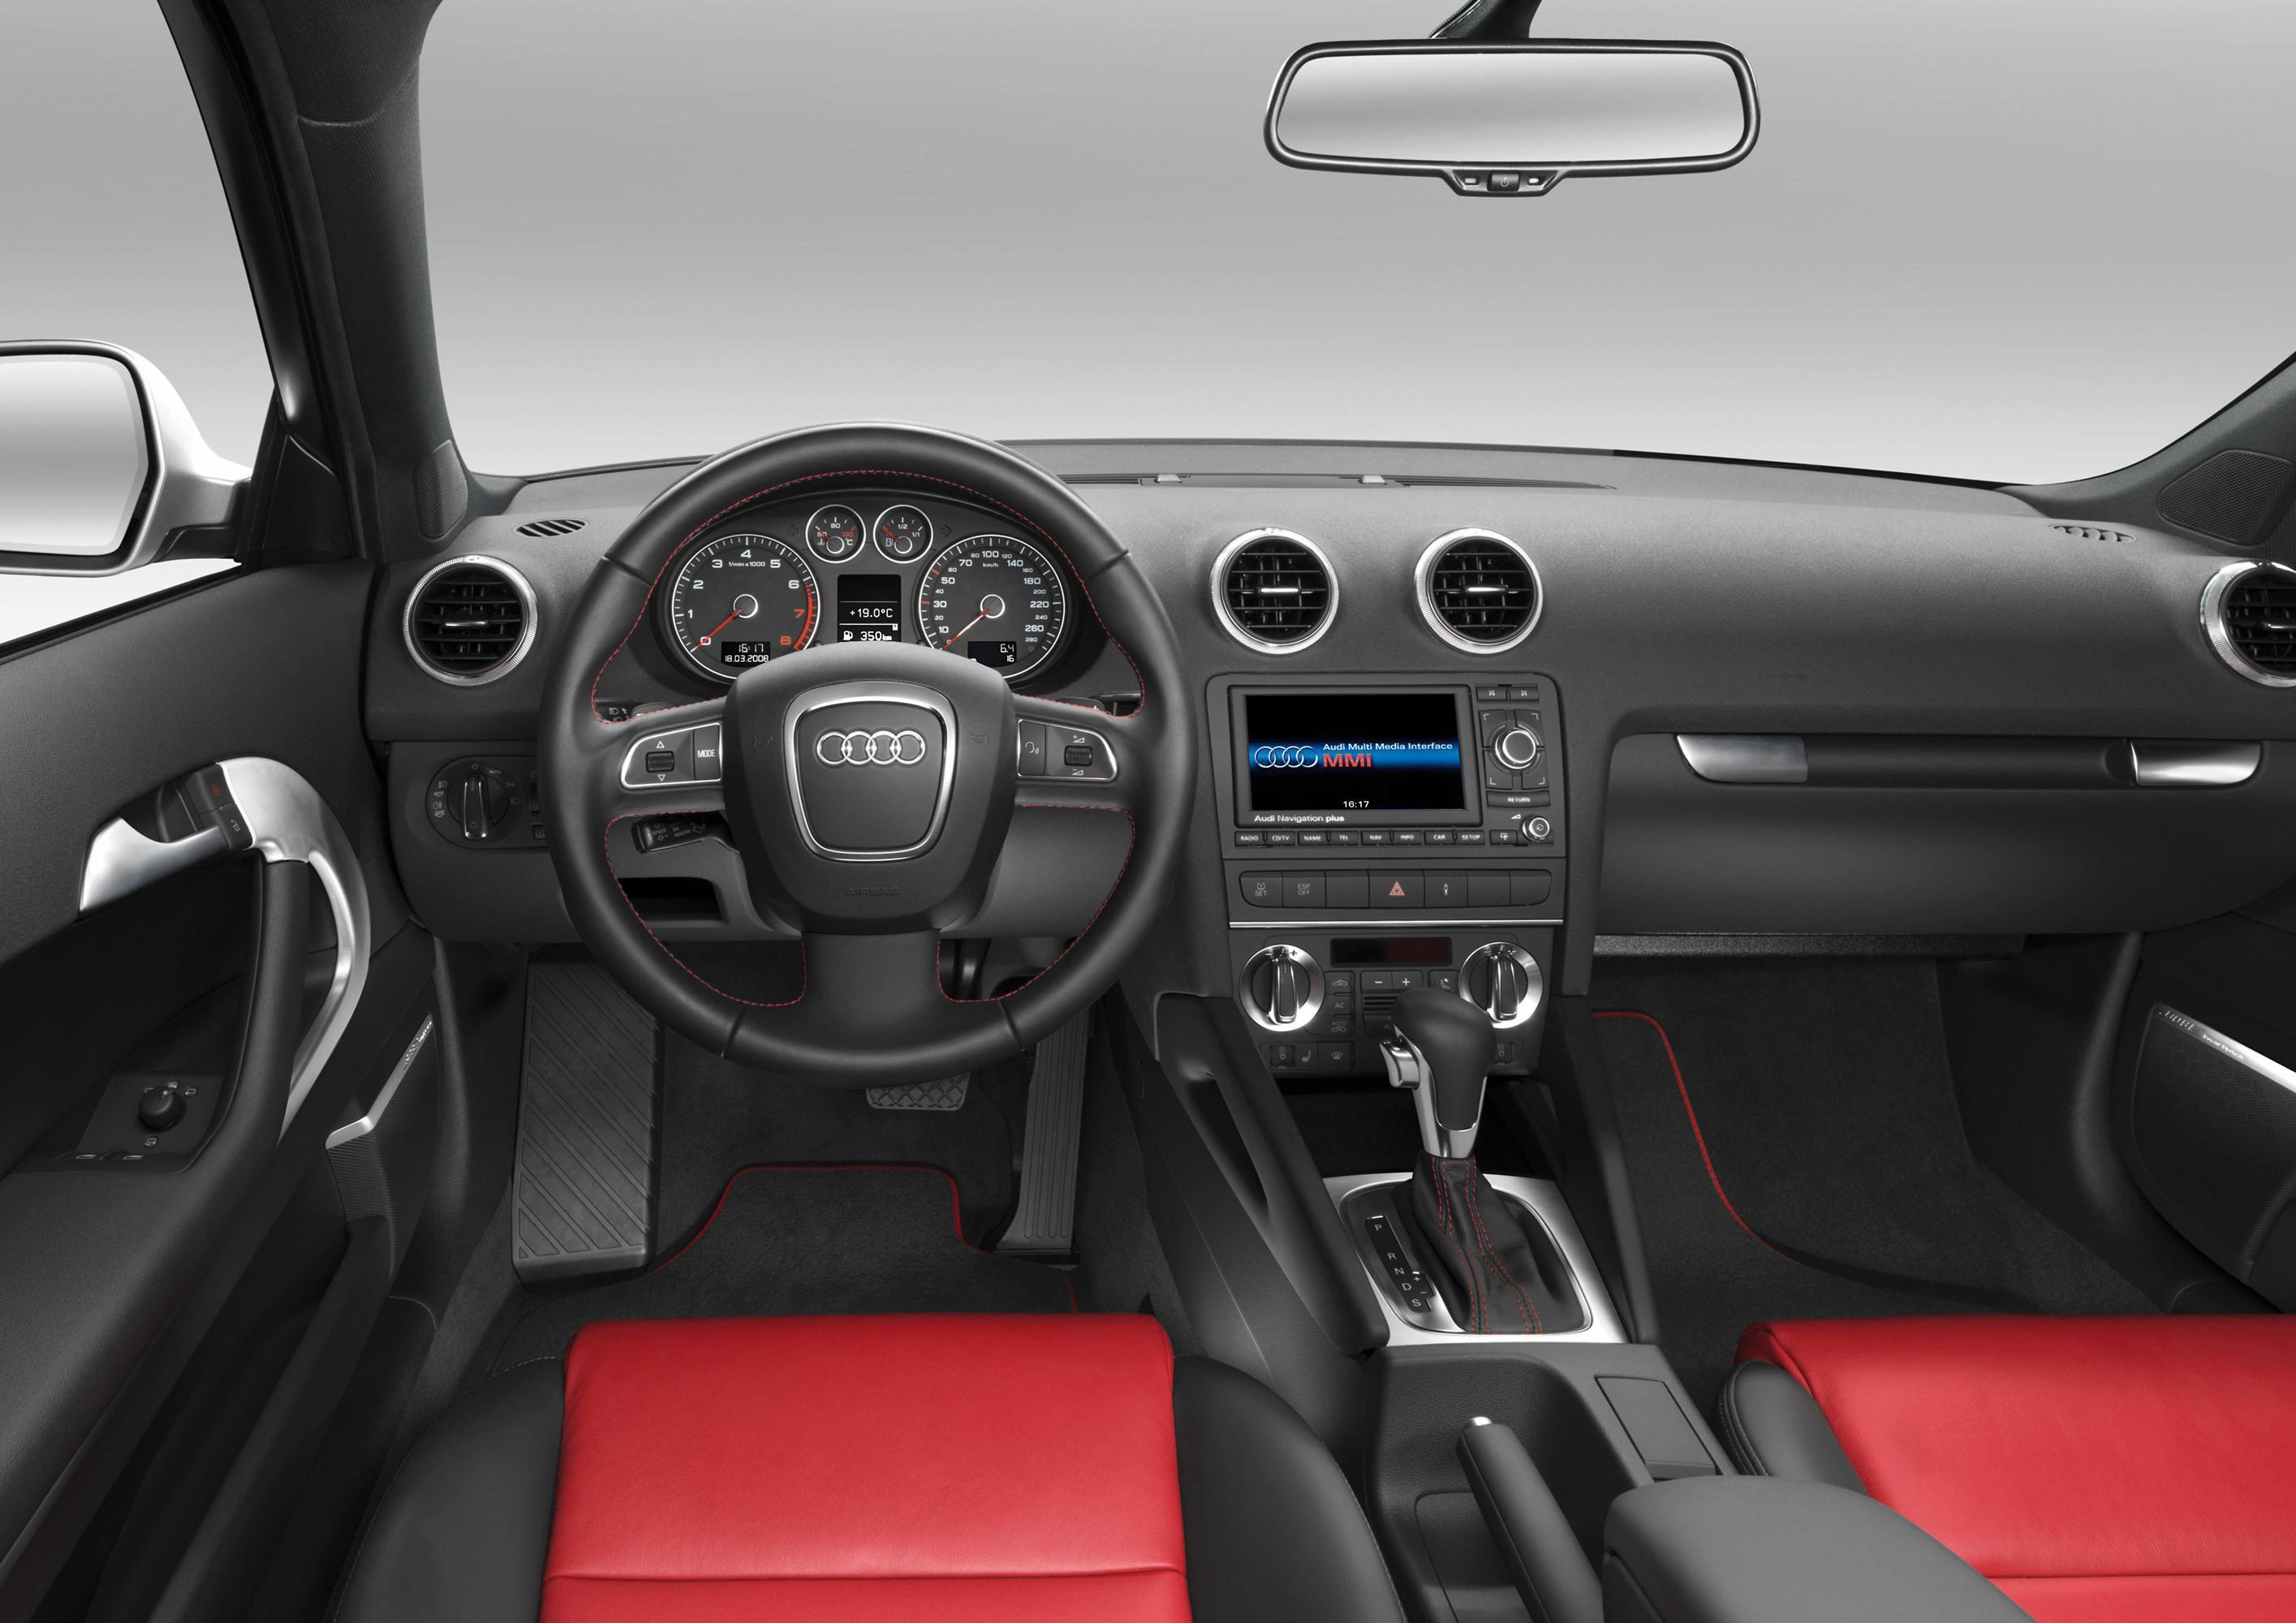 2009 Audi A3 (Euro spec) - Picture 10532